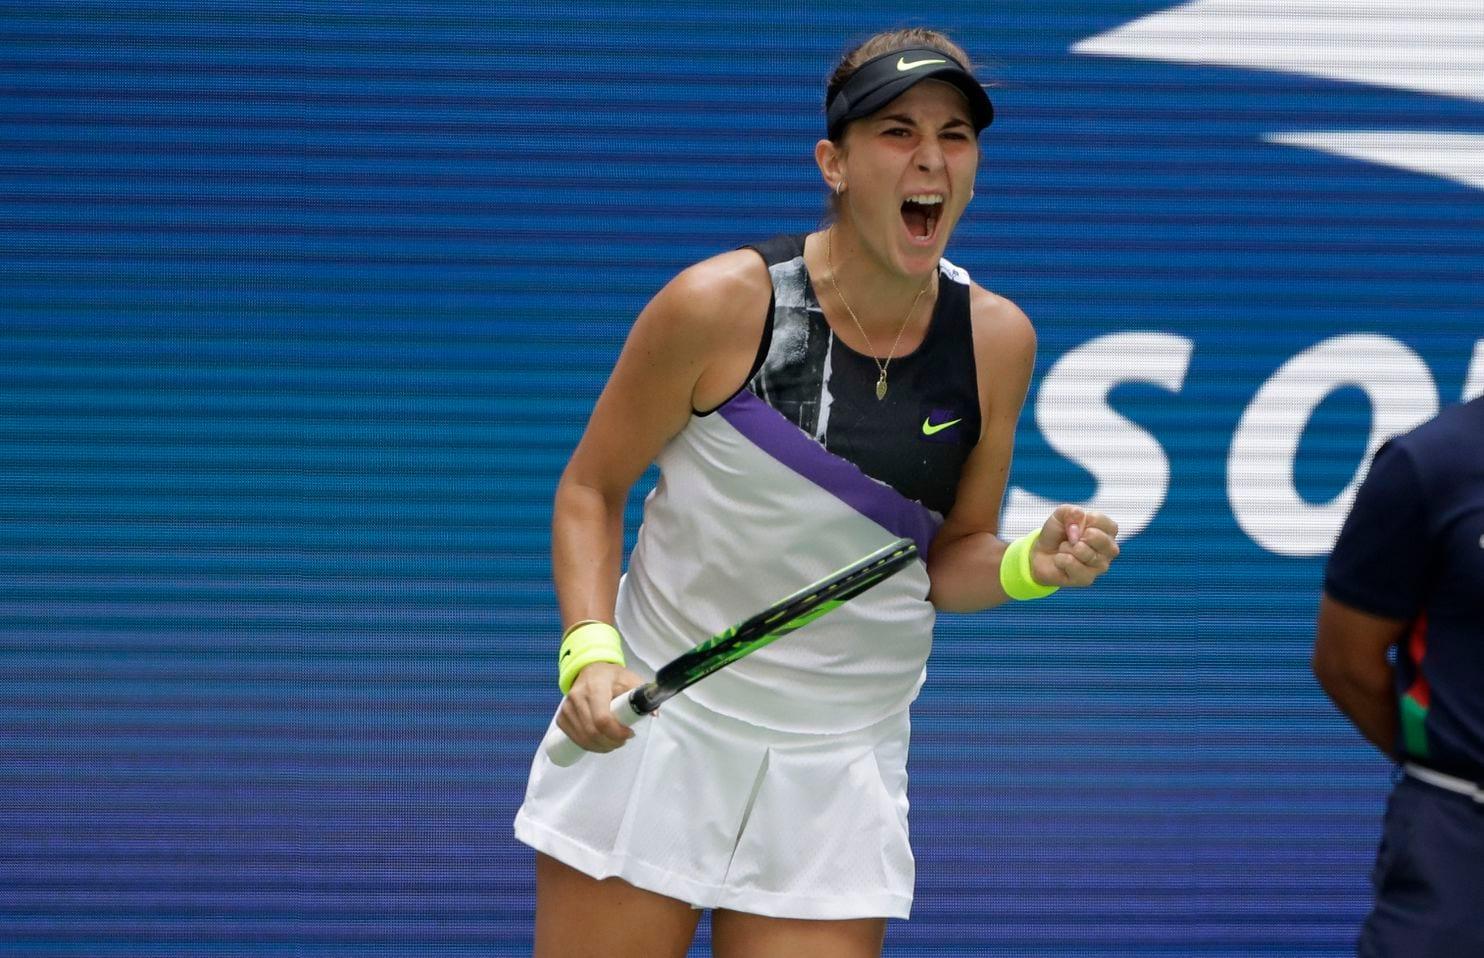 Belinda Bencic derrota crota e faz semi no US Open